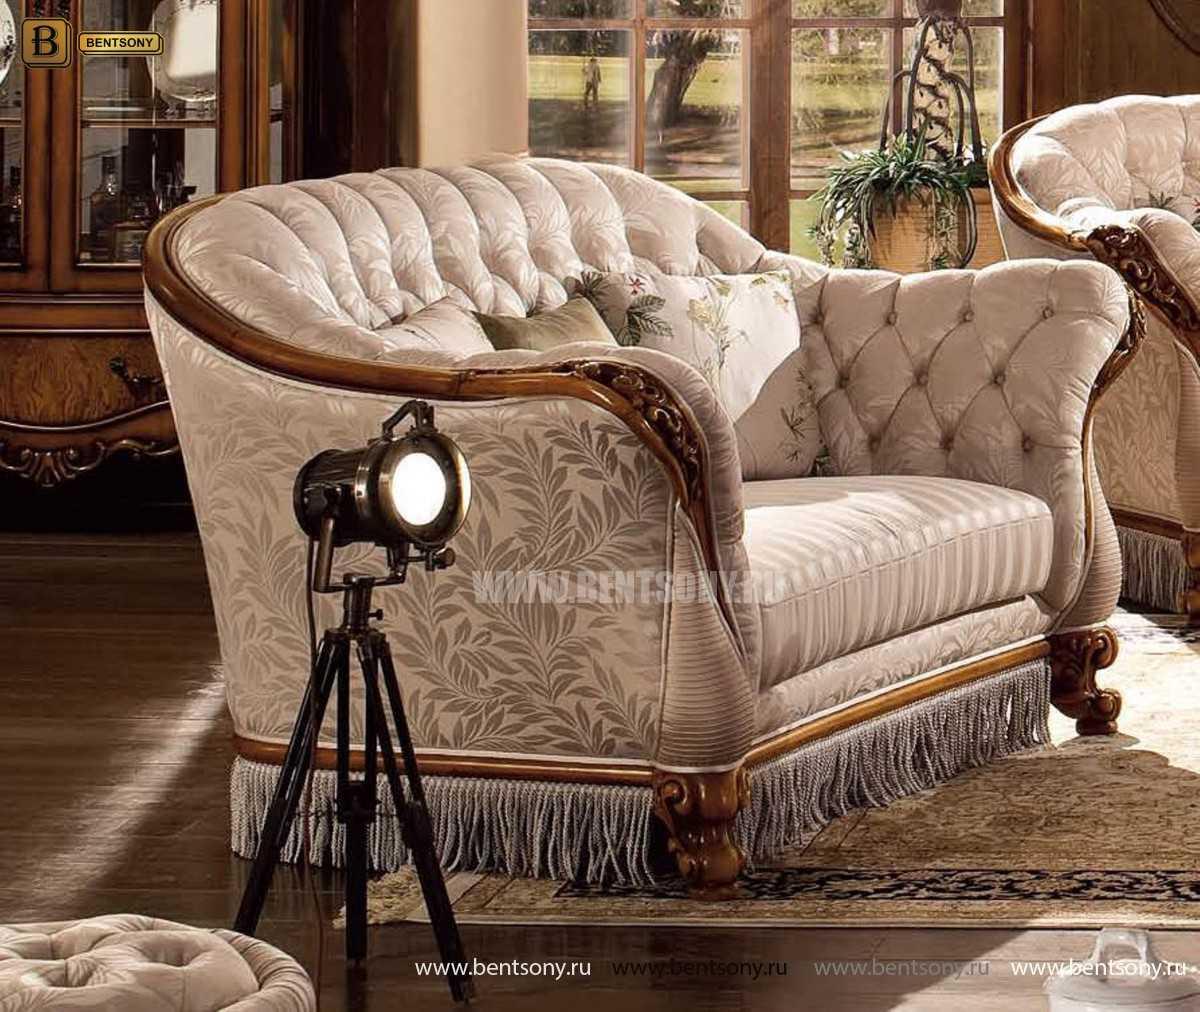 Кресло Дакота B (Классика, Капитоне) распродажа